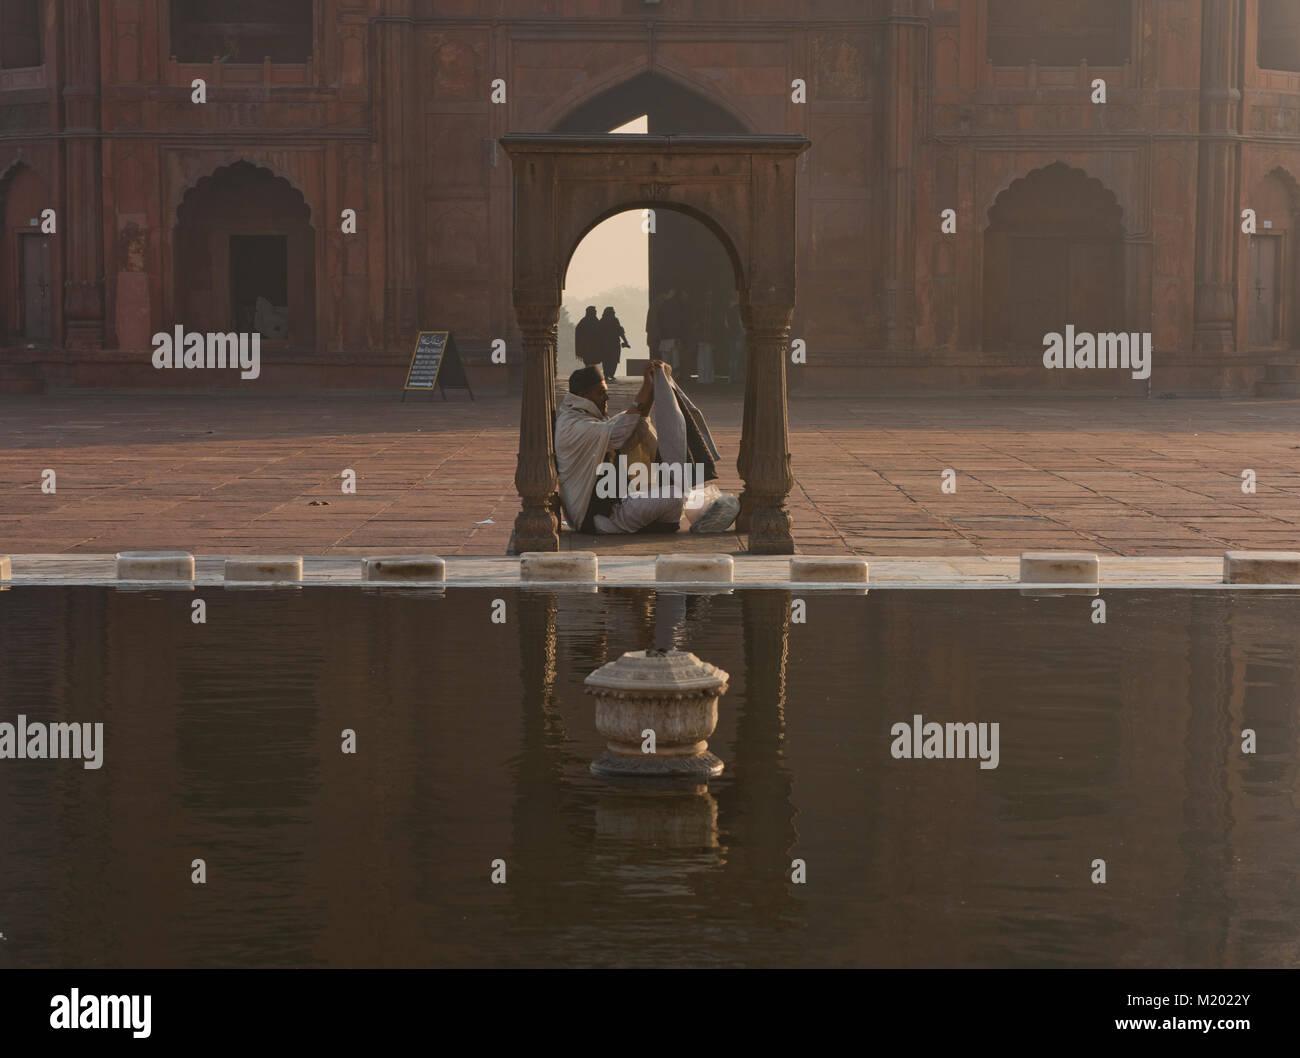 Reflecting pool at Jama Masjid, India's largest mosque, Old Delhi - Stock Image